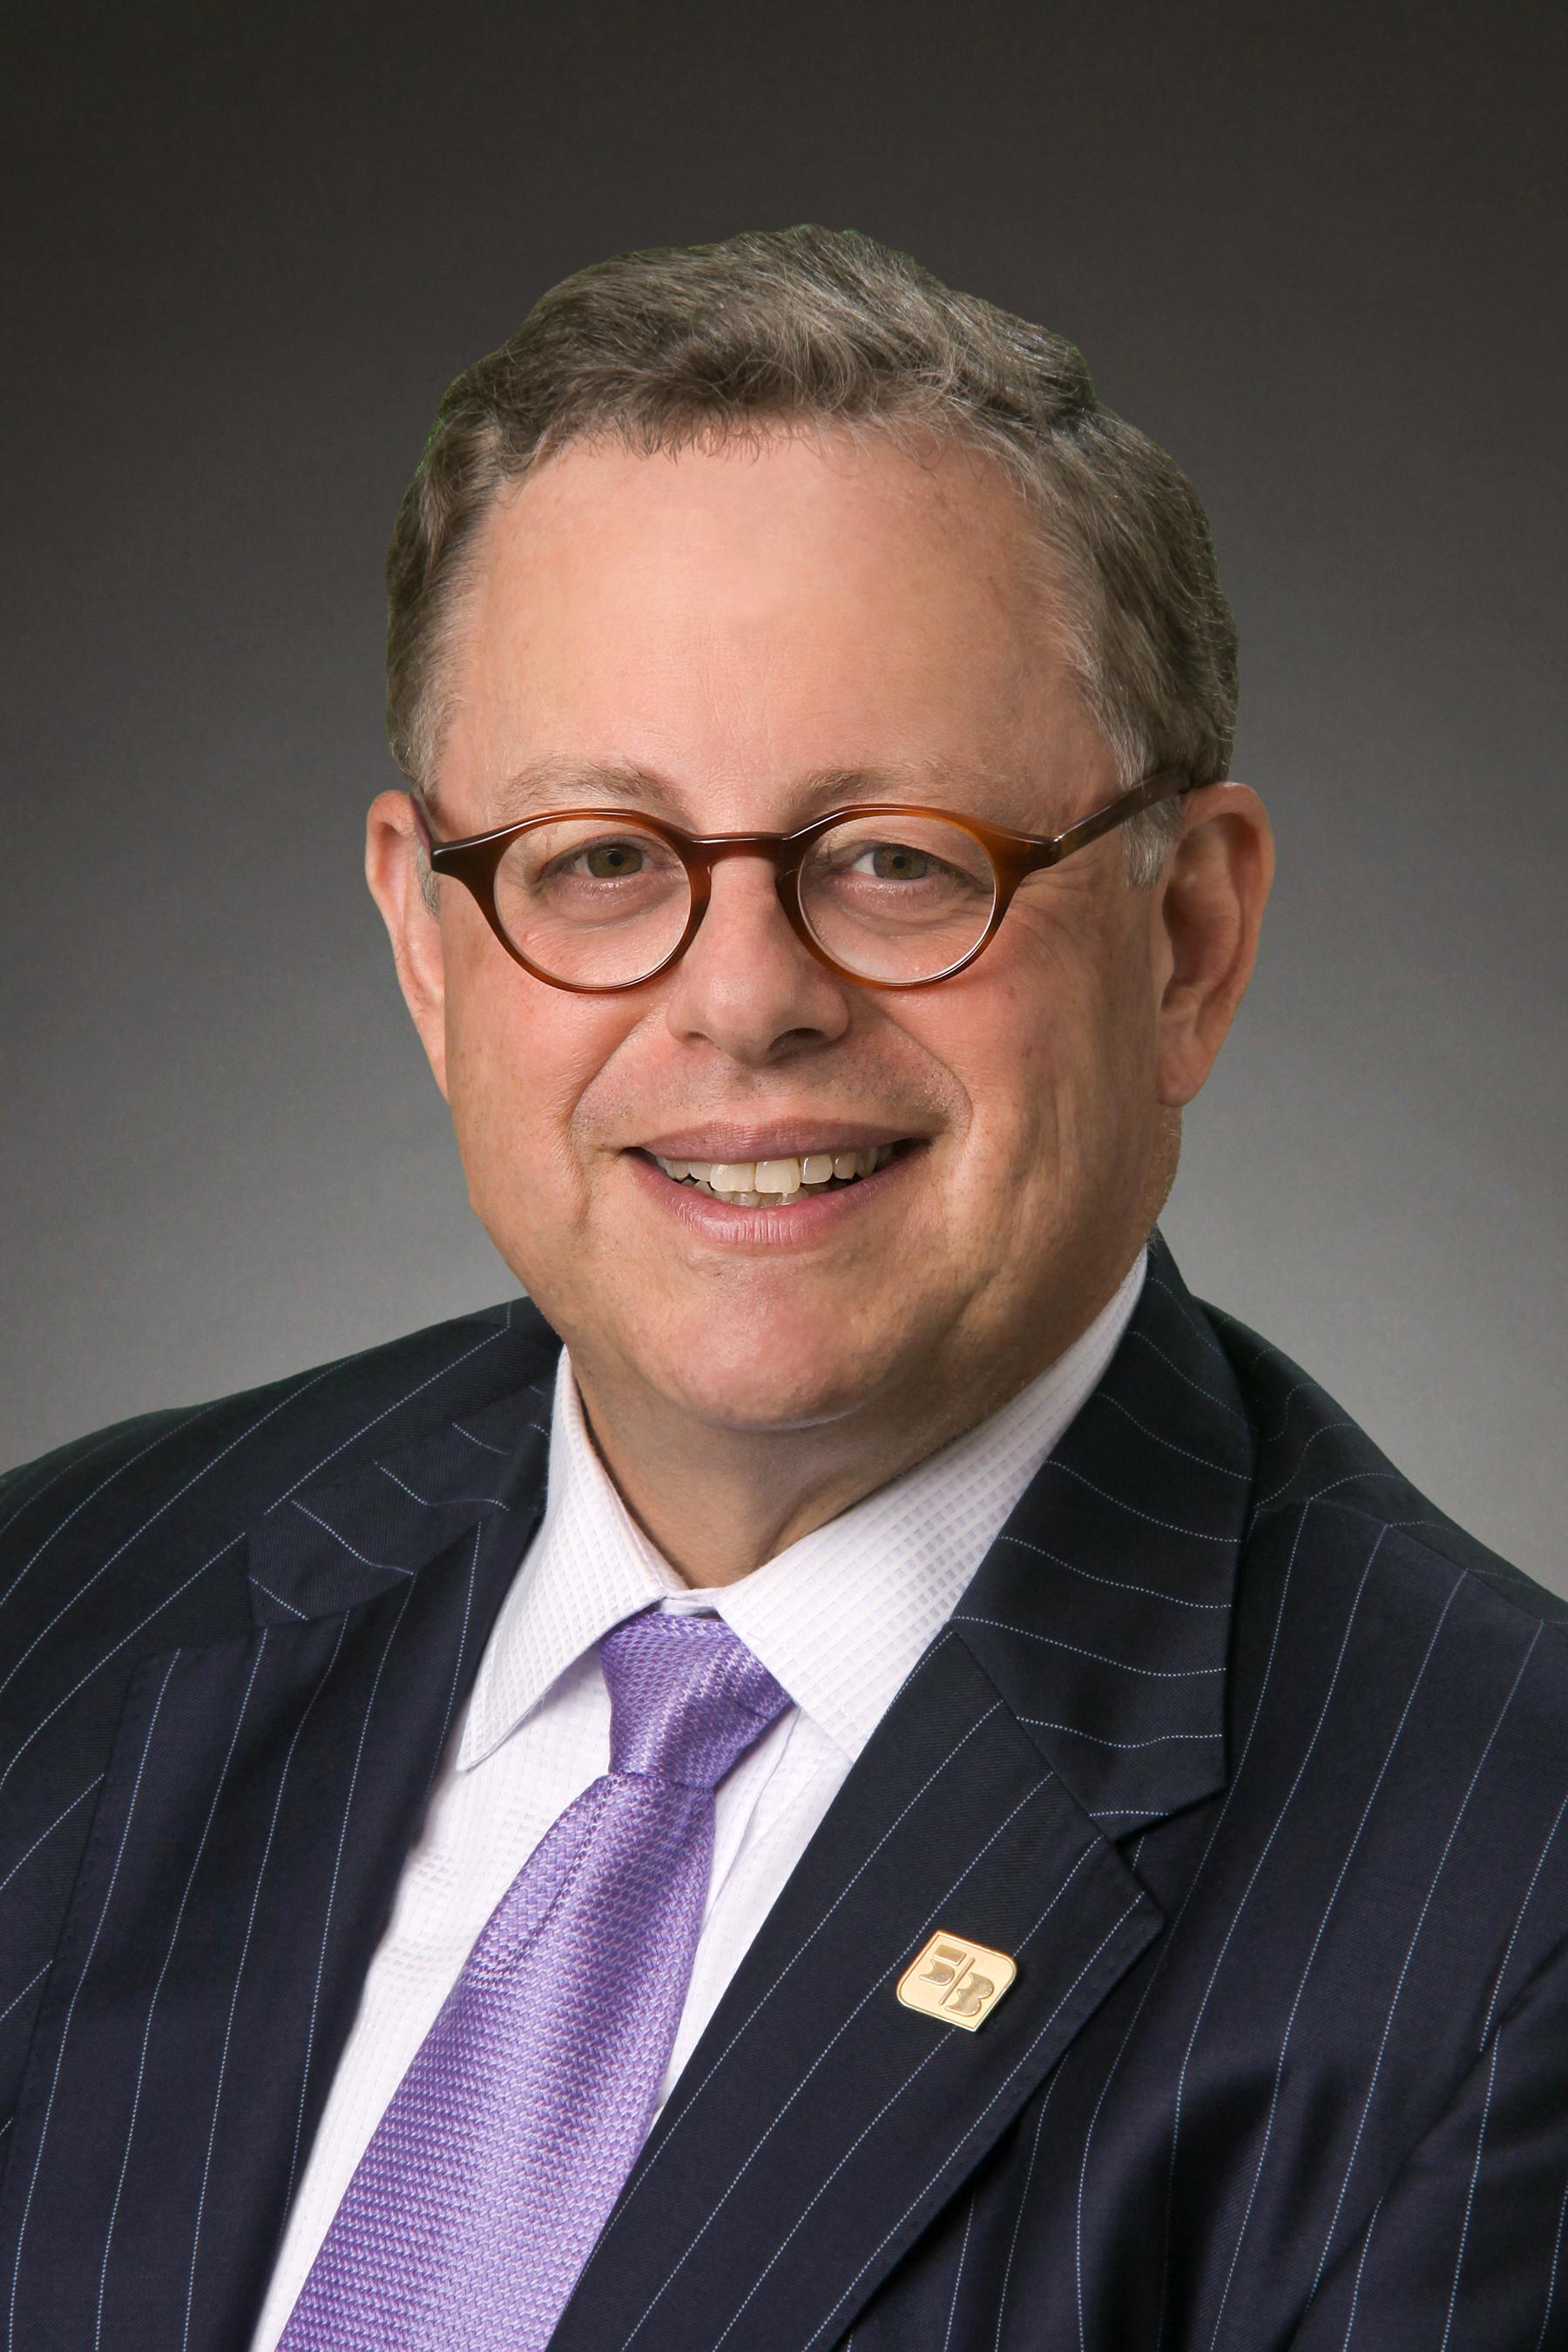 Jeffrey Korzenik